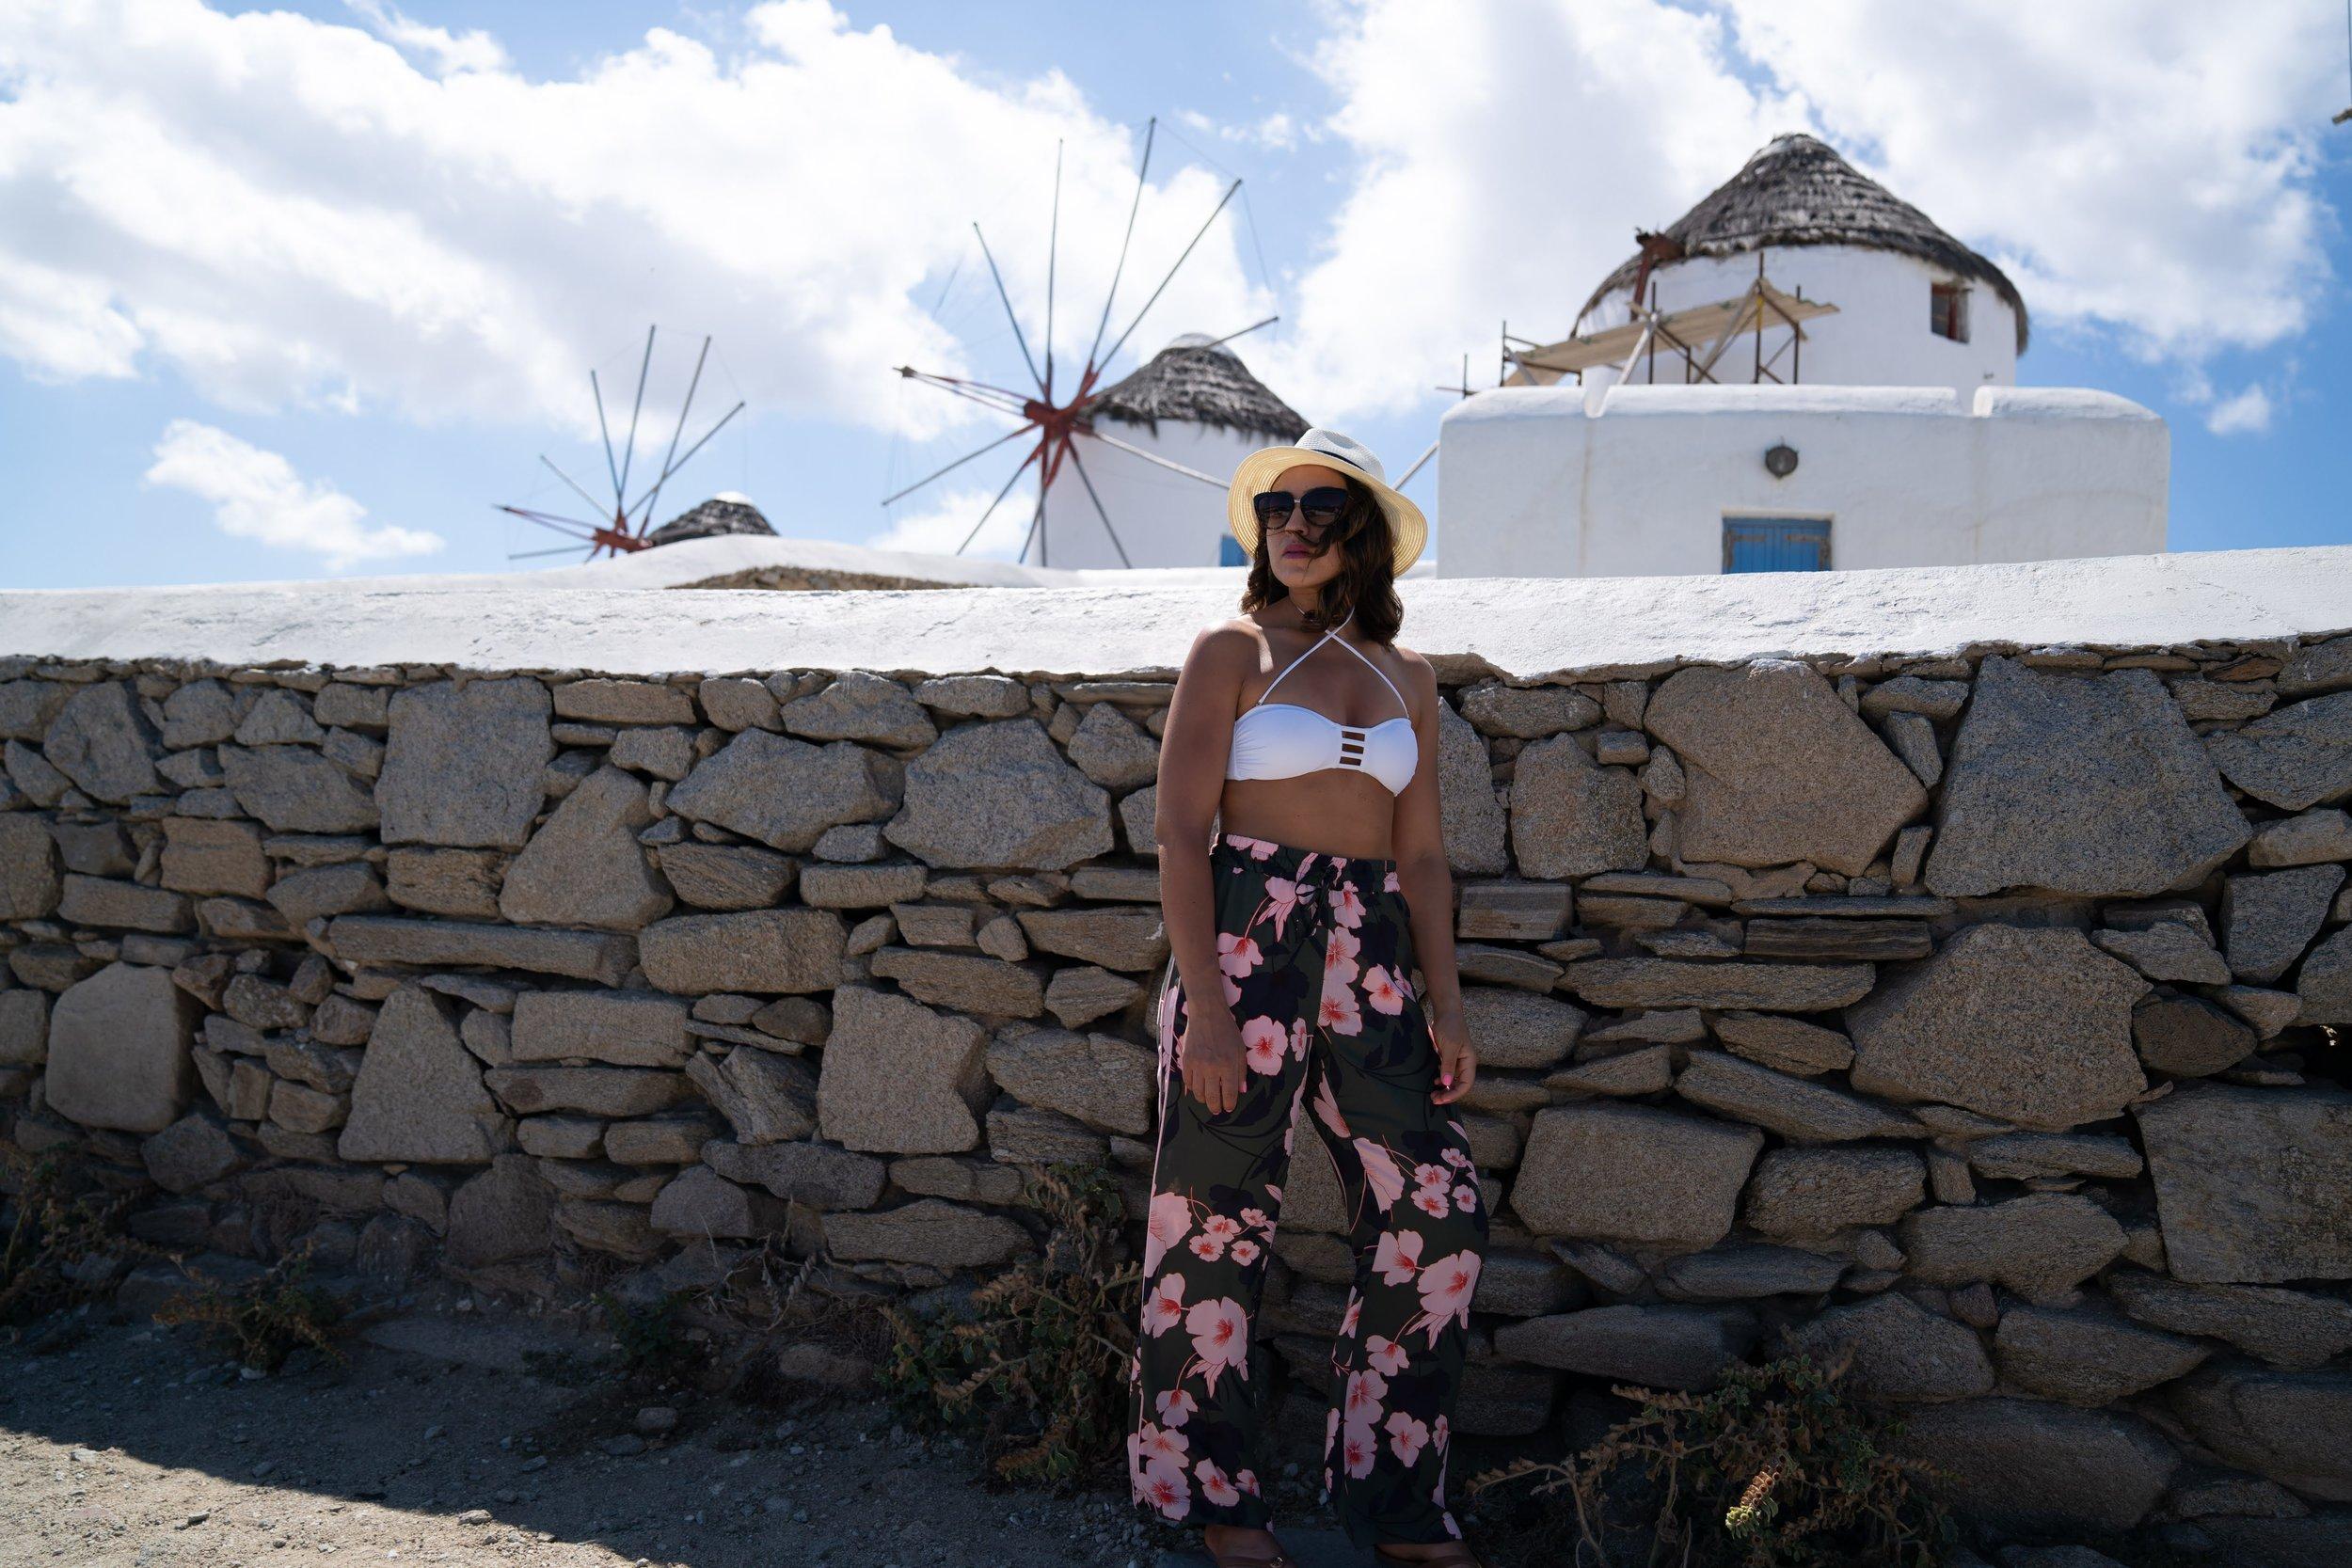 Pants: Macys // Bikini Top: older one linked similar  here  //  Hat : Nordstrom Rack //  Sunglasses : Kate Spade